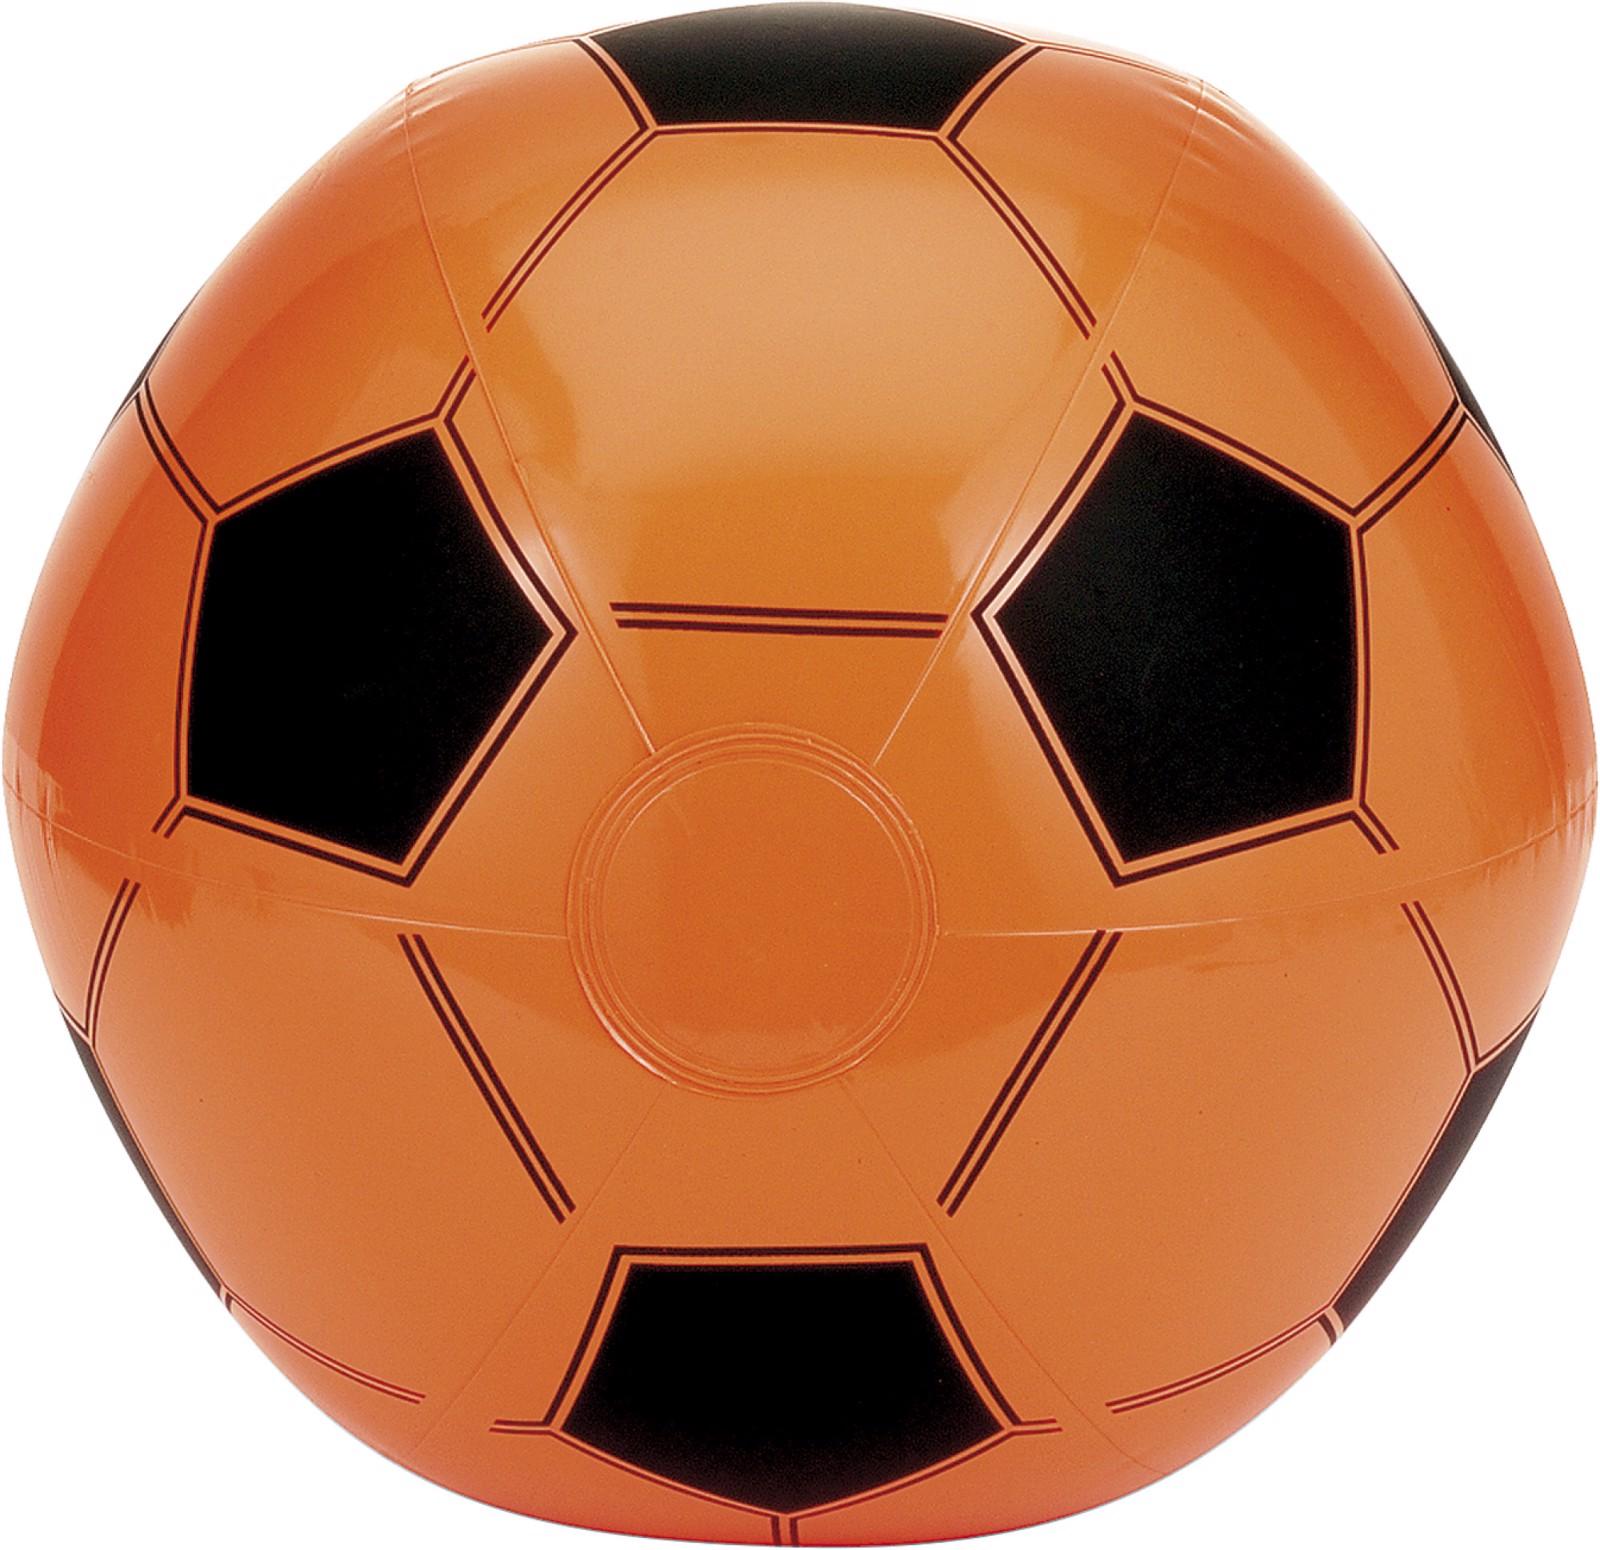 PVC football - Orange